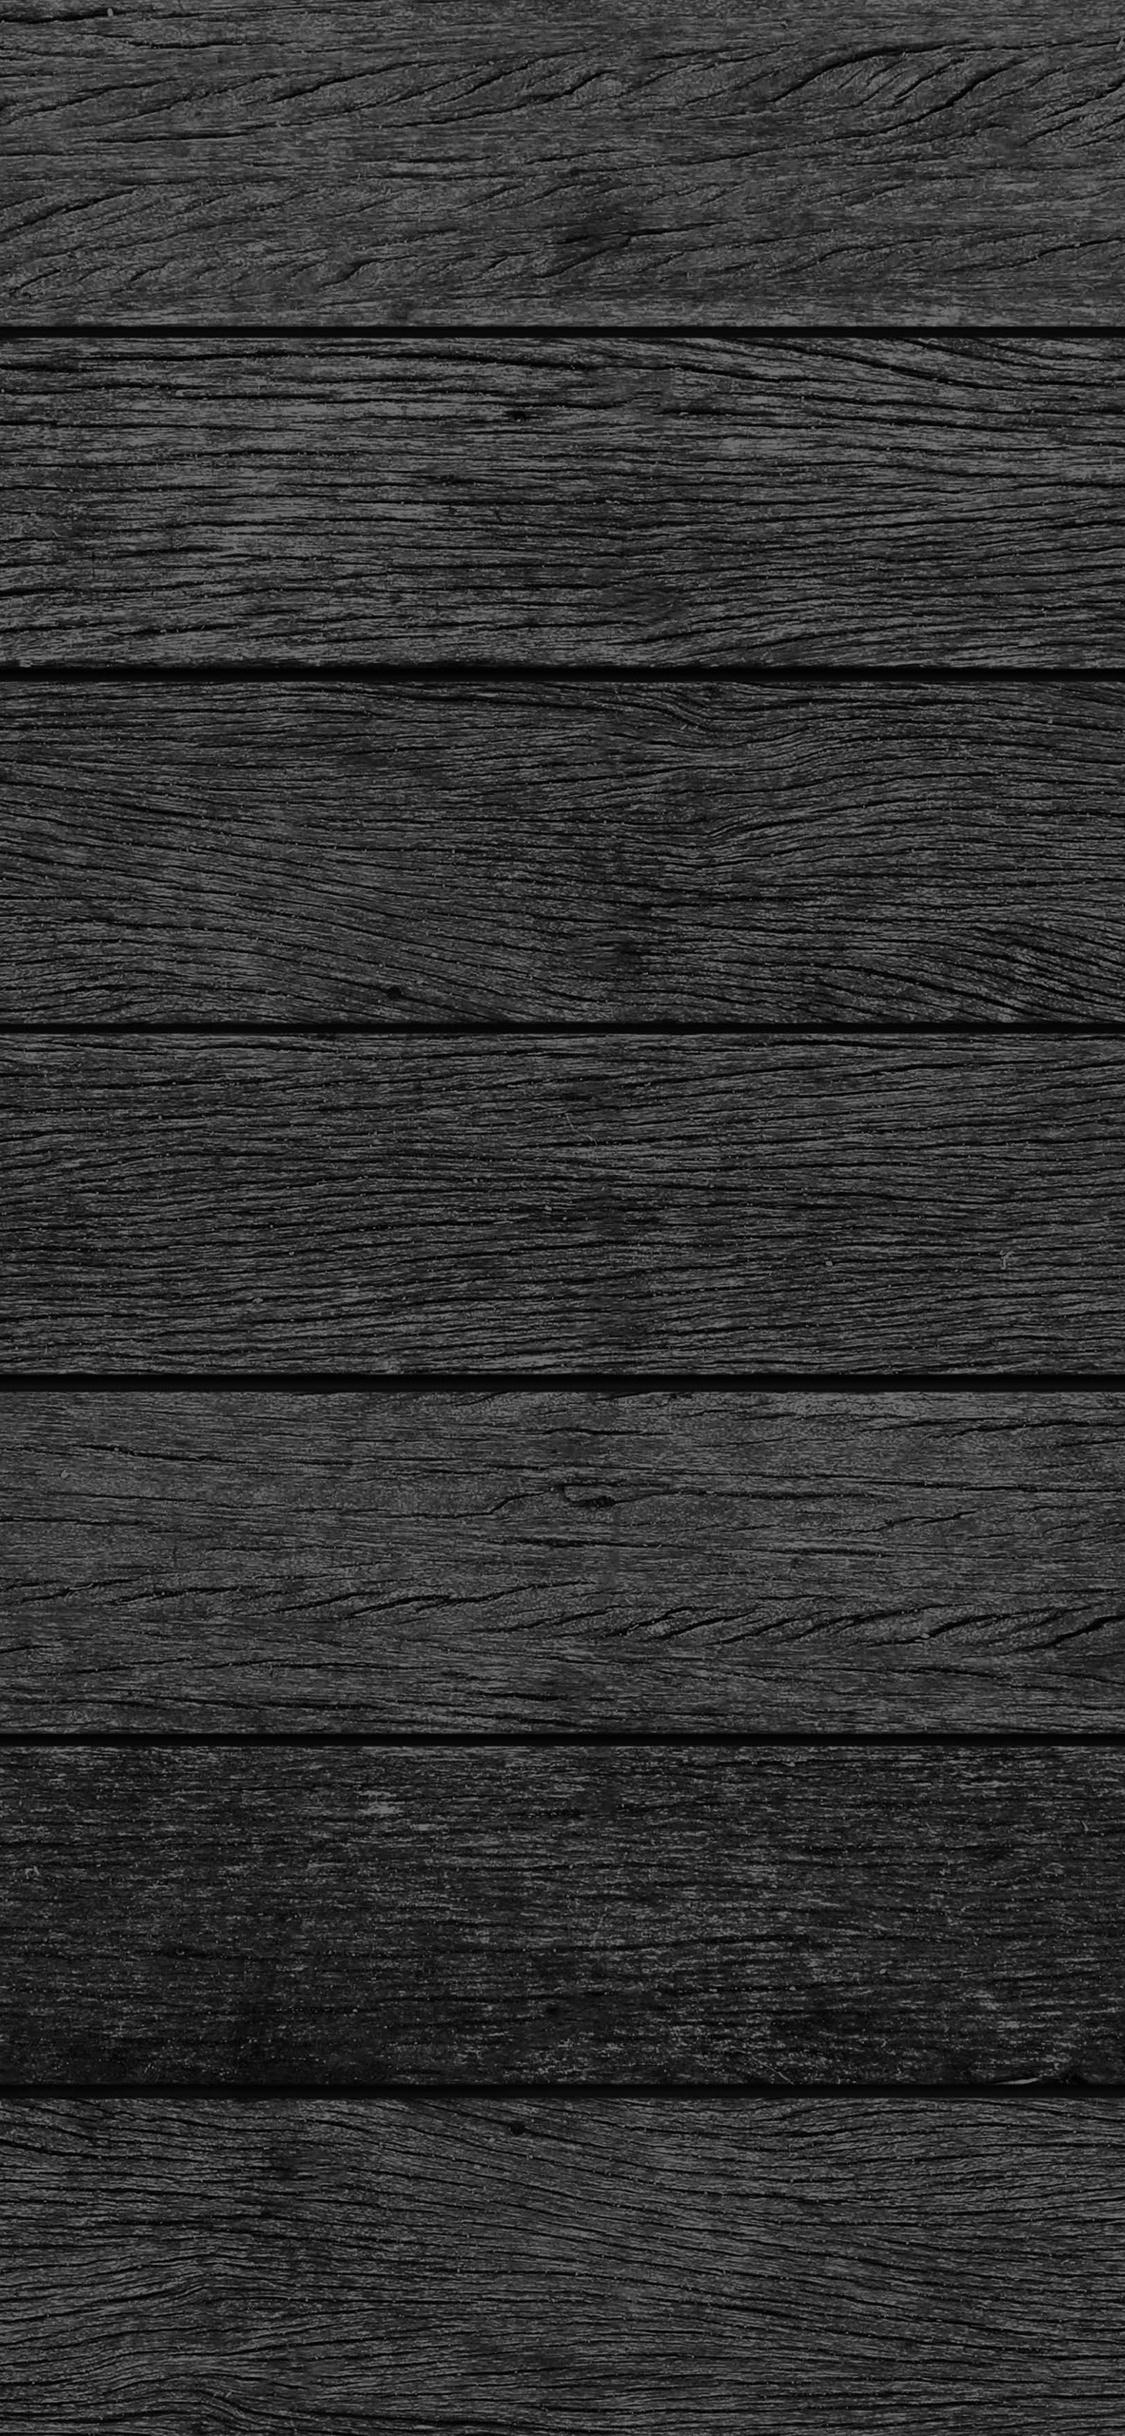 1125x2436 Abstract Dark Wood Iphone Xs Iphone 10 Iphone X Hd 4k